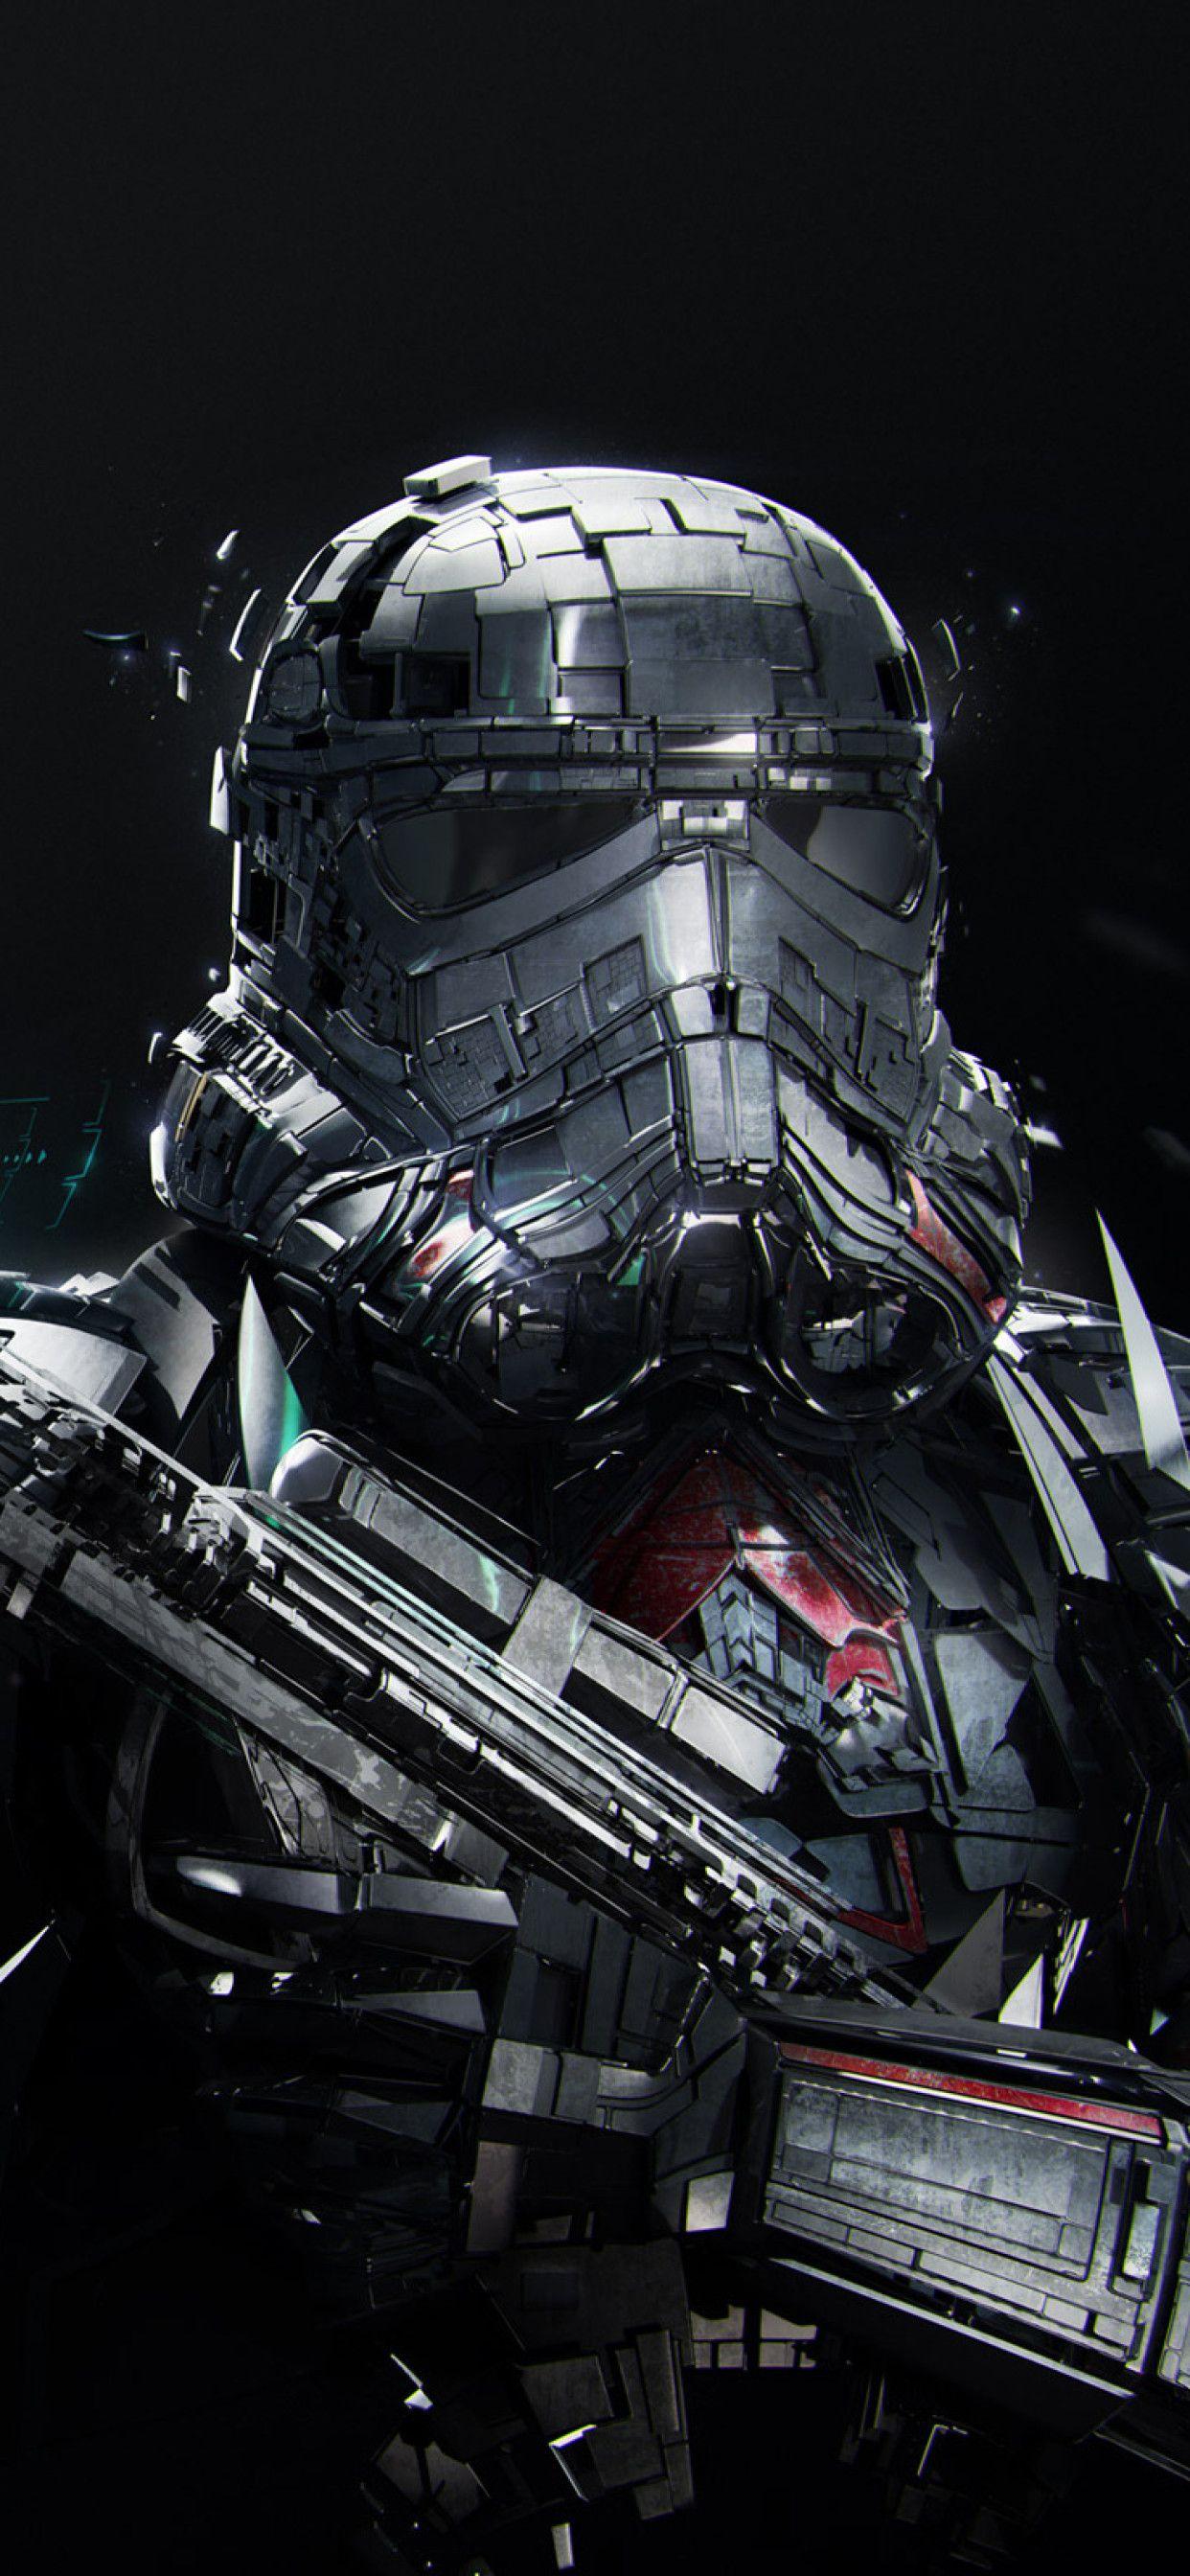 Star Wars Stormtrooper In 1242x2688 Resolution in 2020